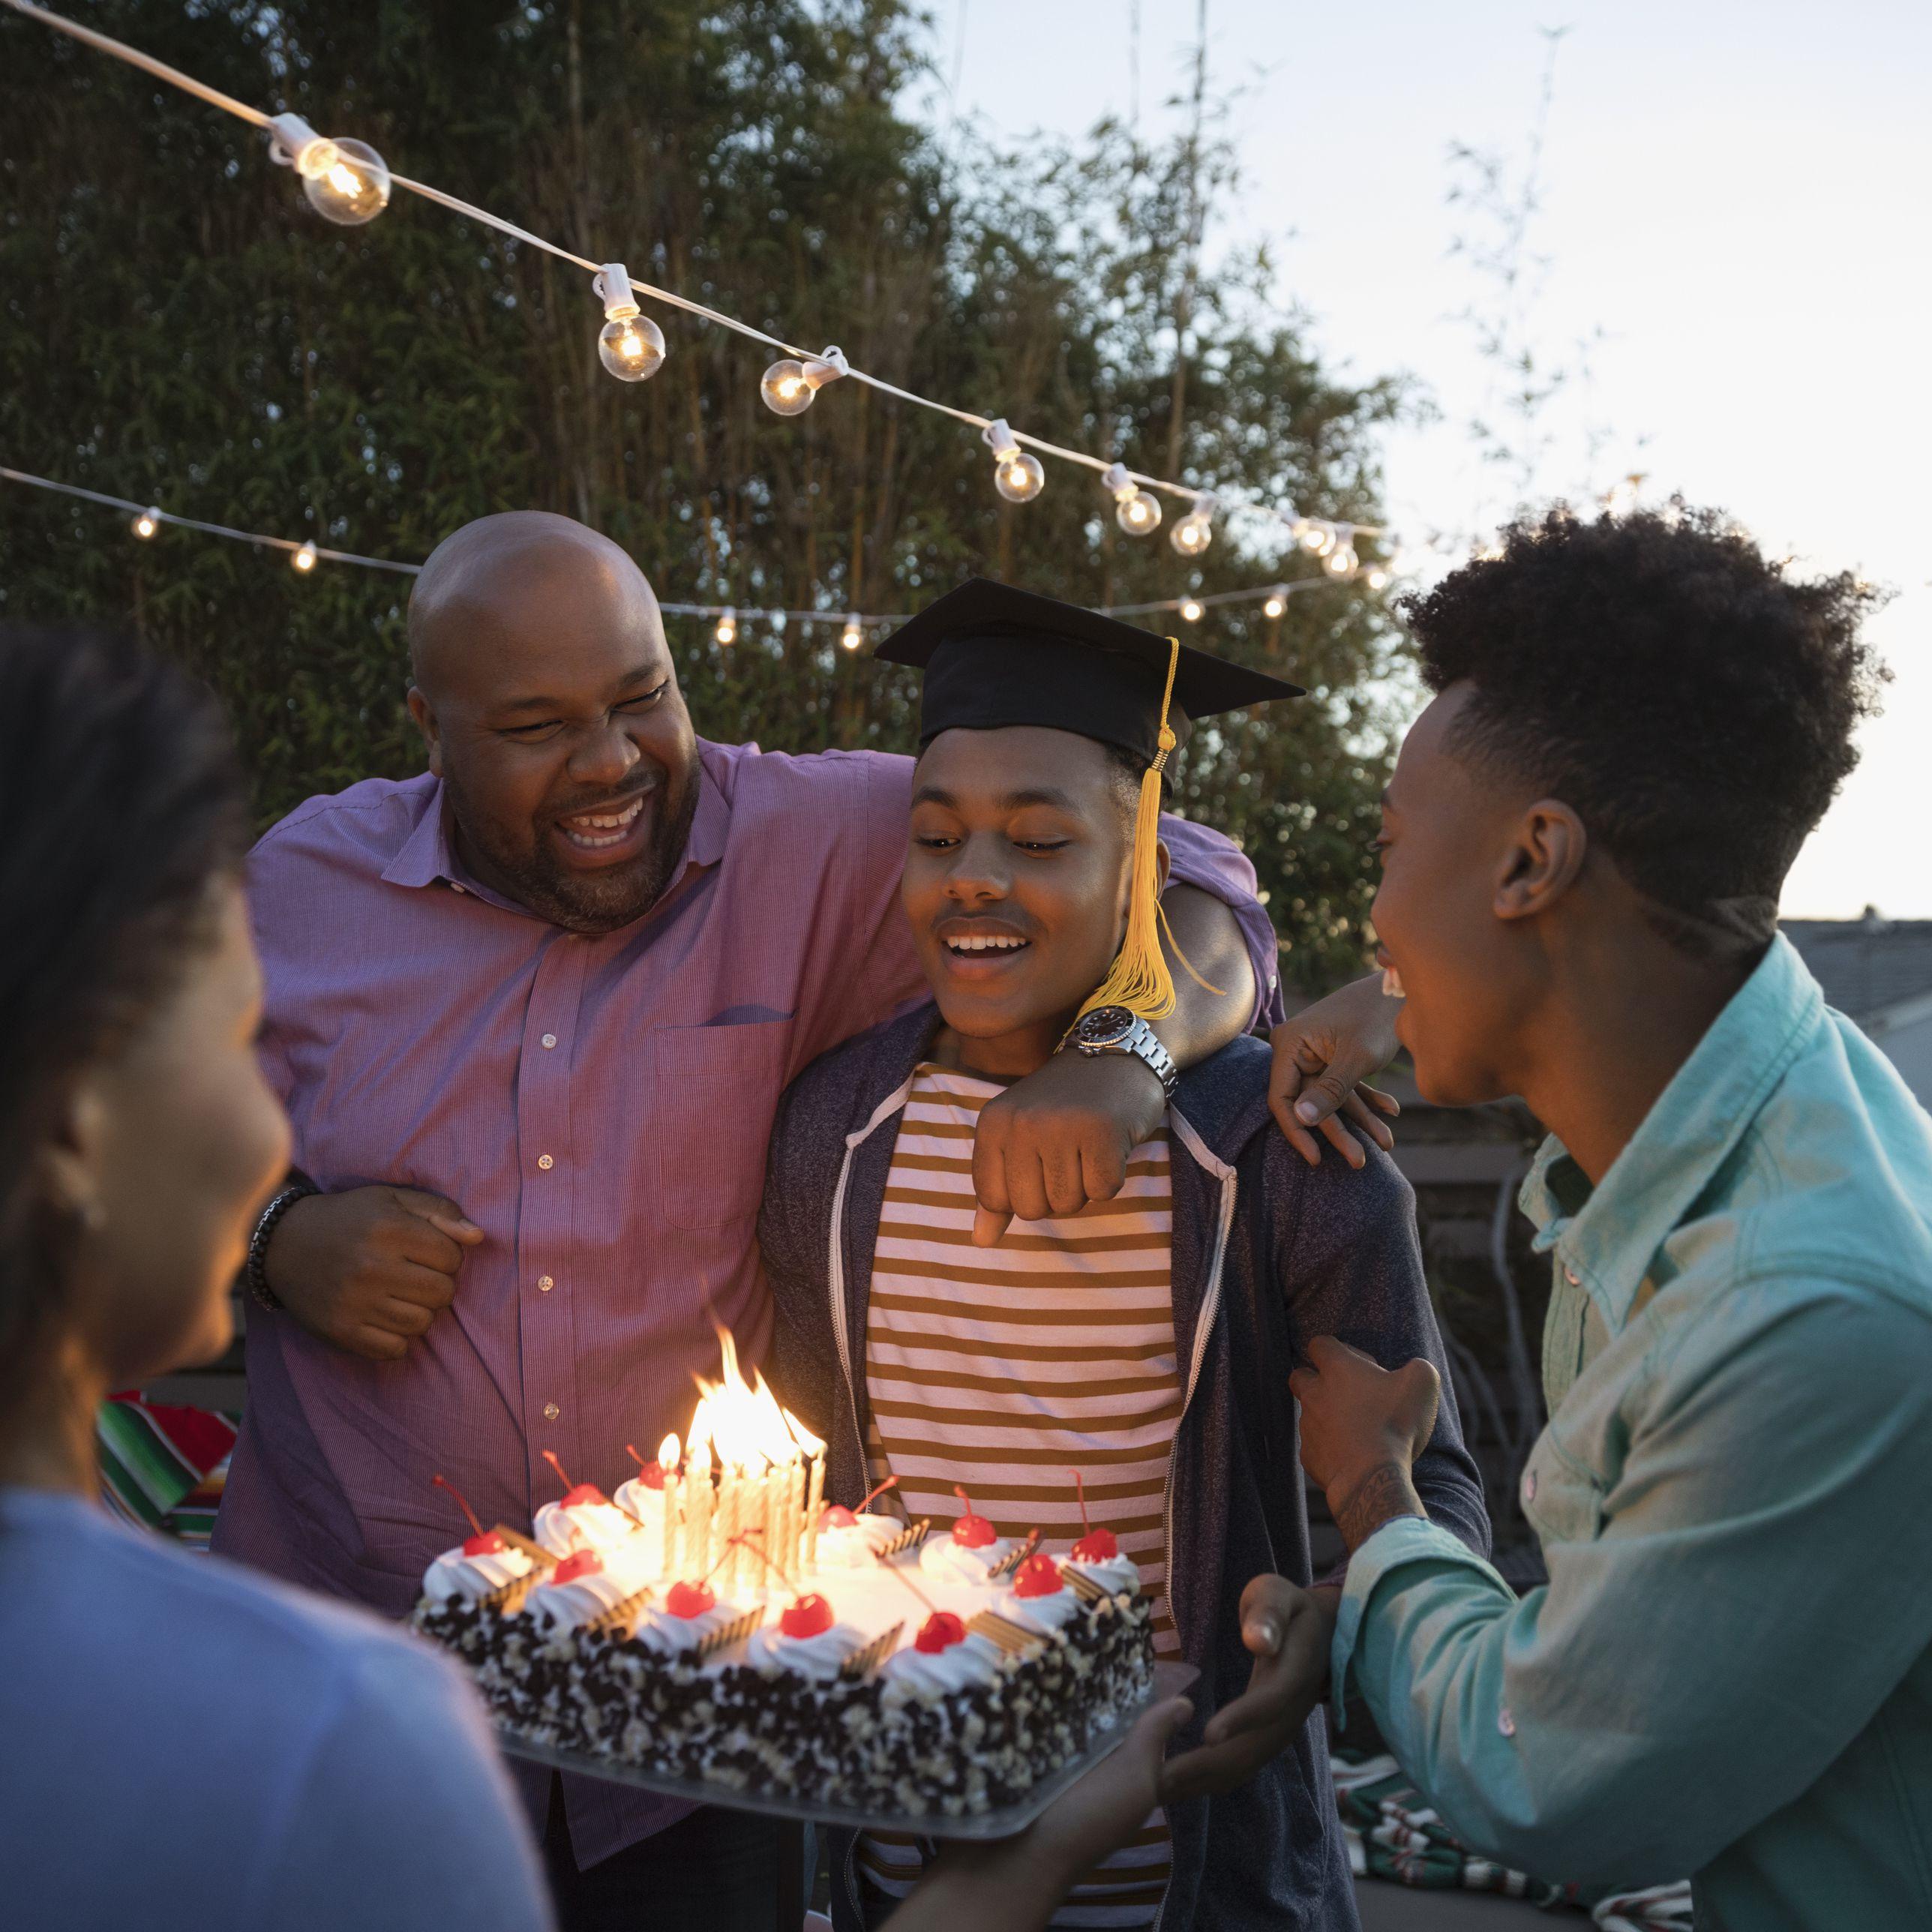 18 Ideas For A Memorable College Graduation Party